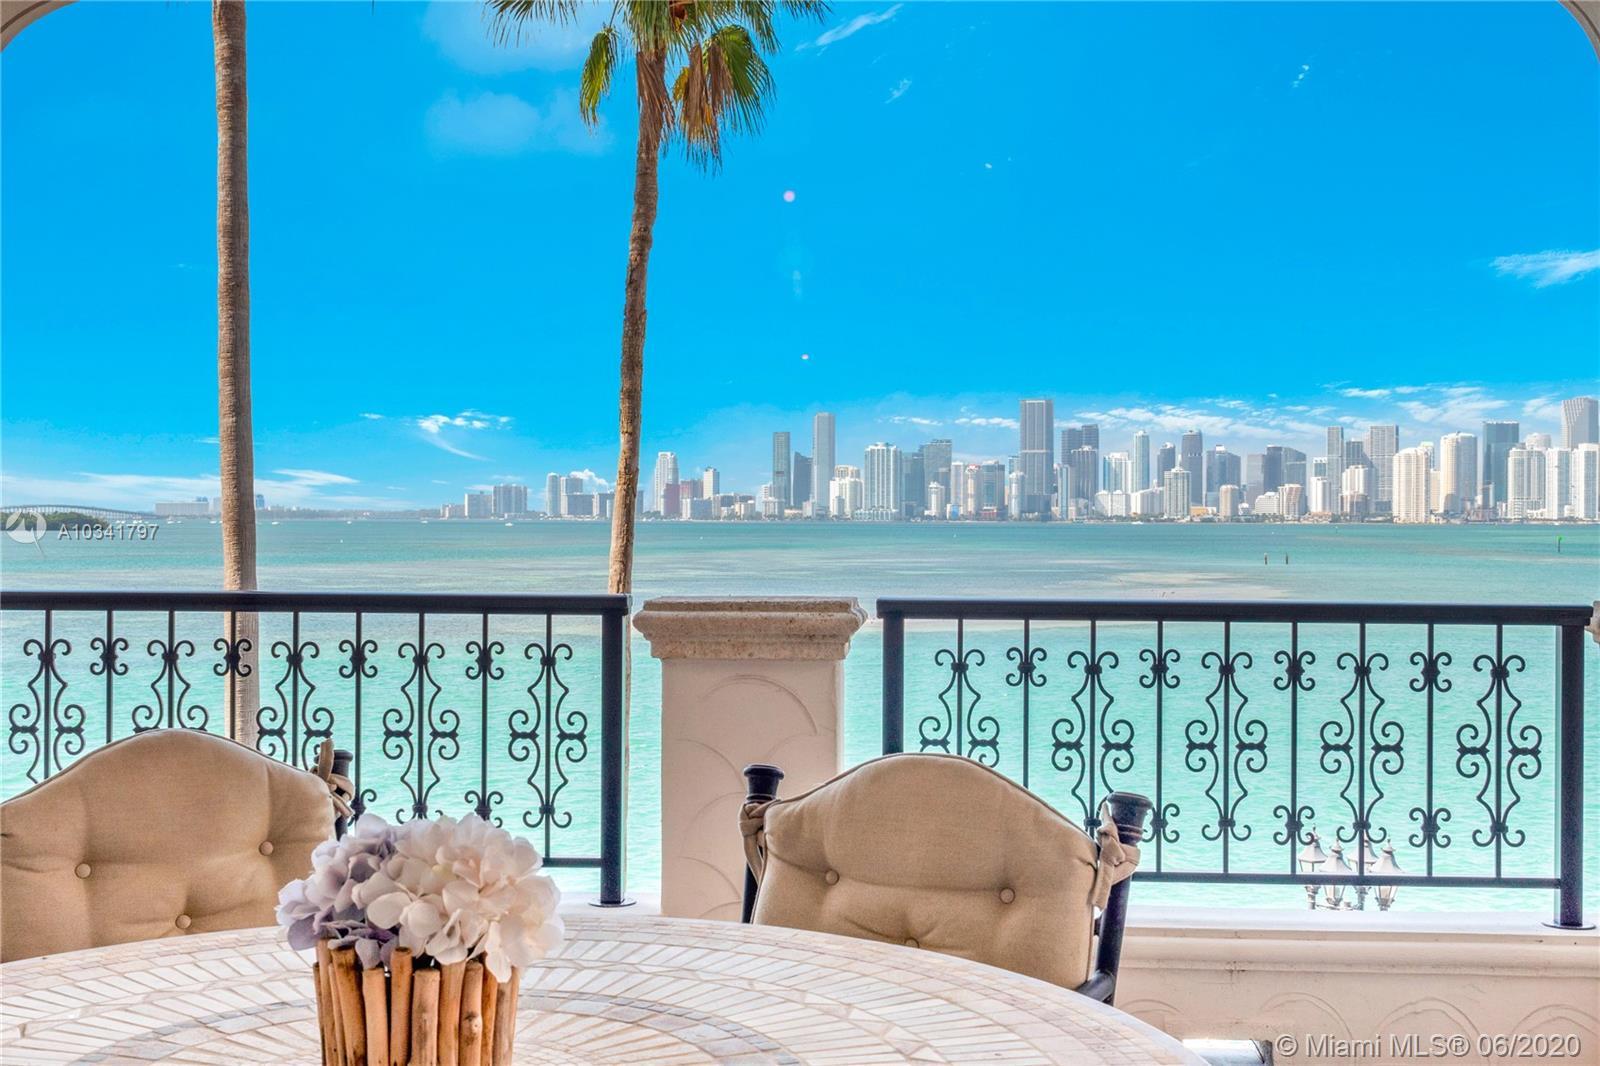 5235 Fisher Island Dr 5235, Miami Beach, FL 33109